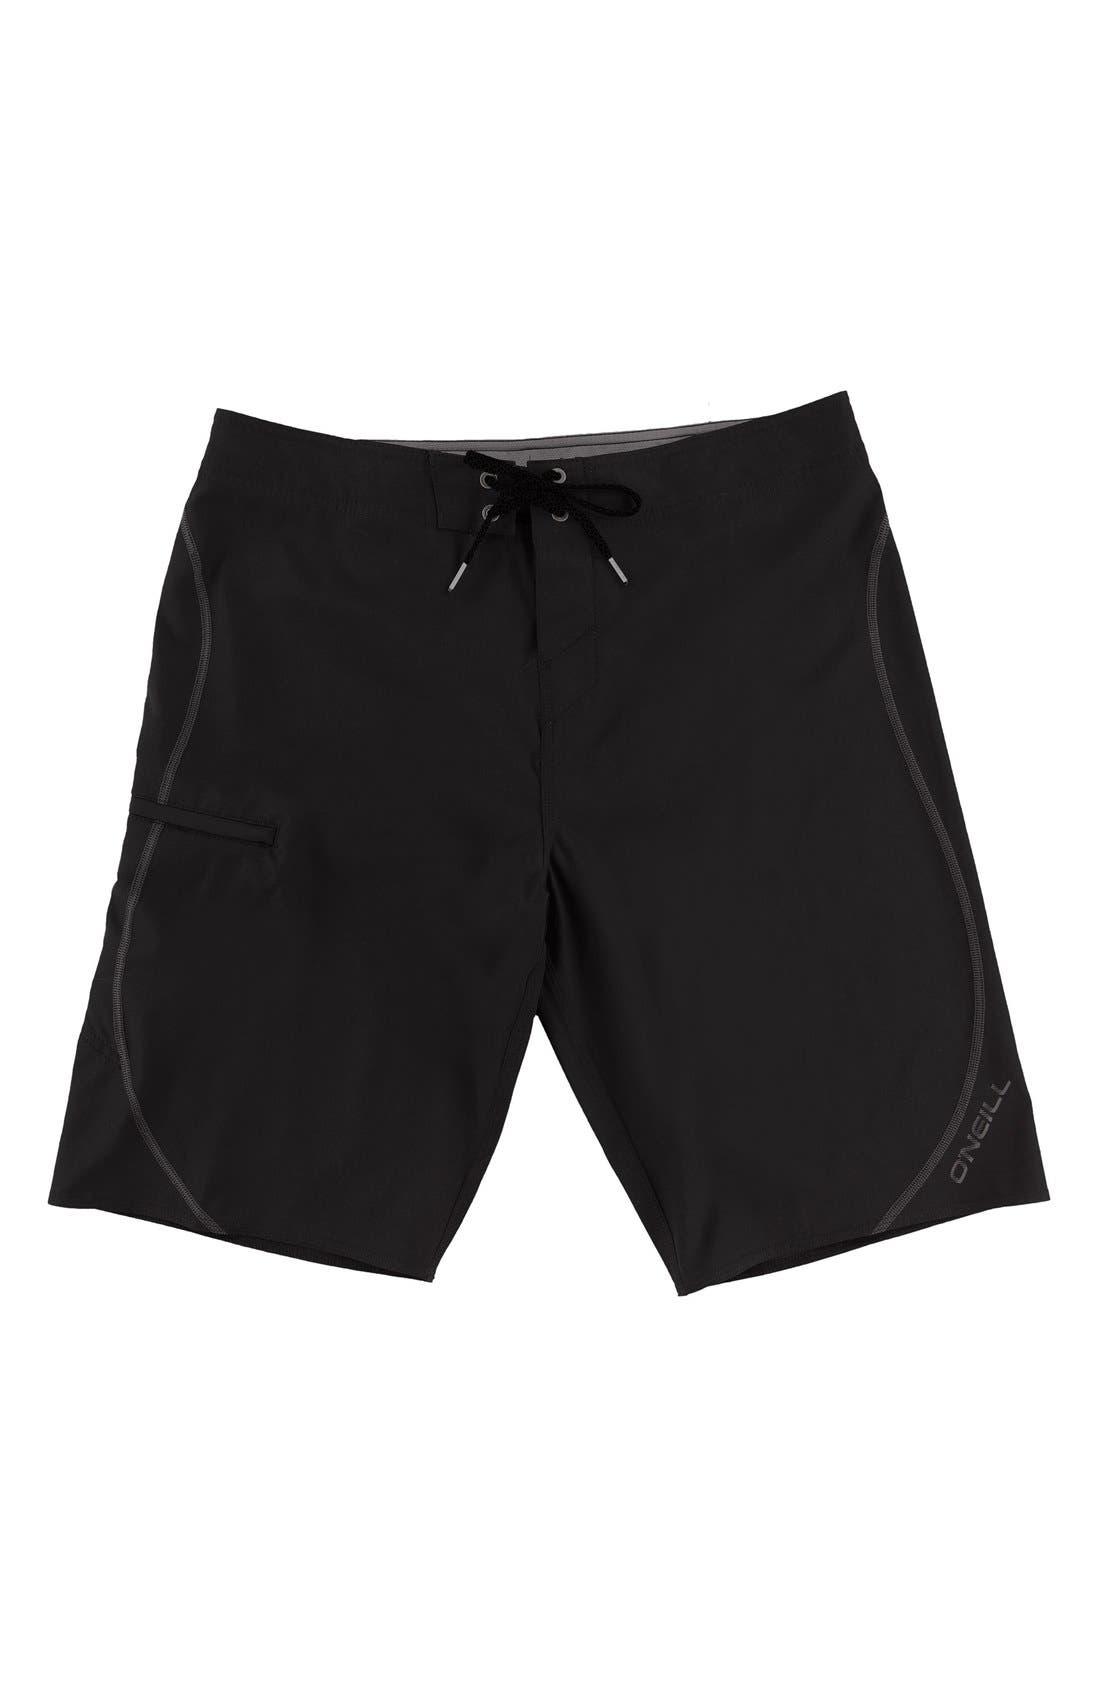 Hyperfreak S-Seam Stretch Board Shorts,                             Main thumbnail 1, color,                             001